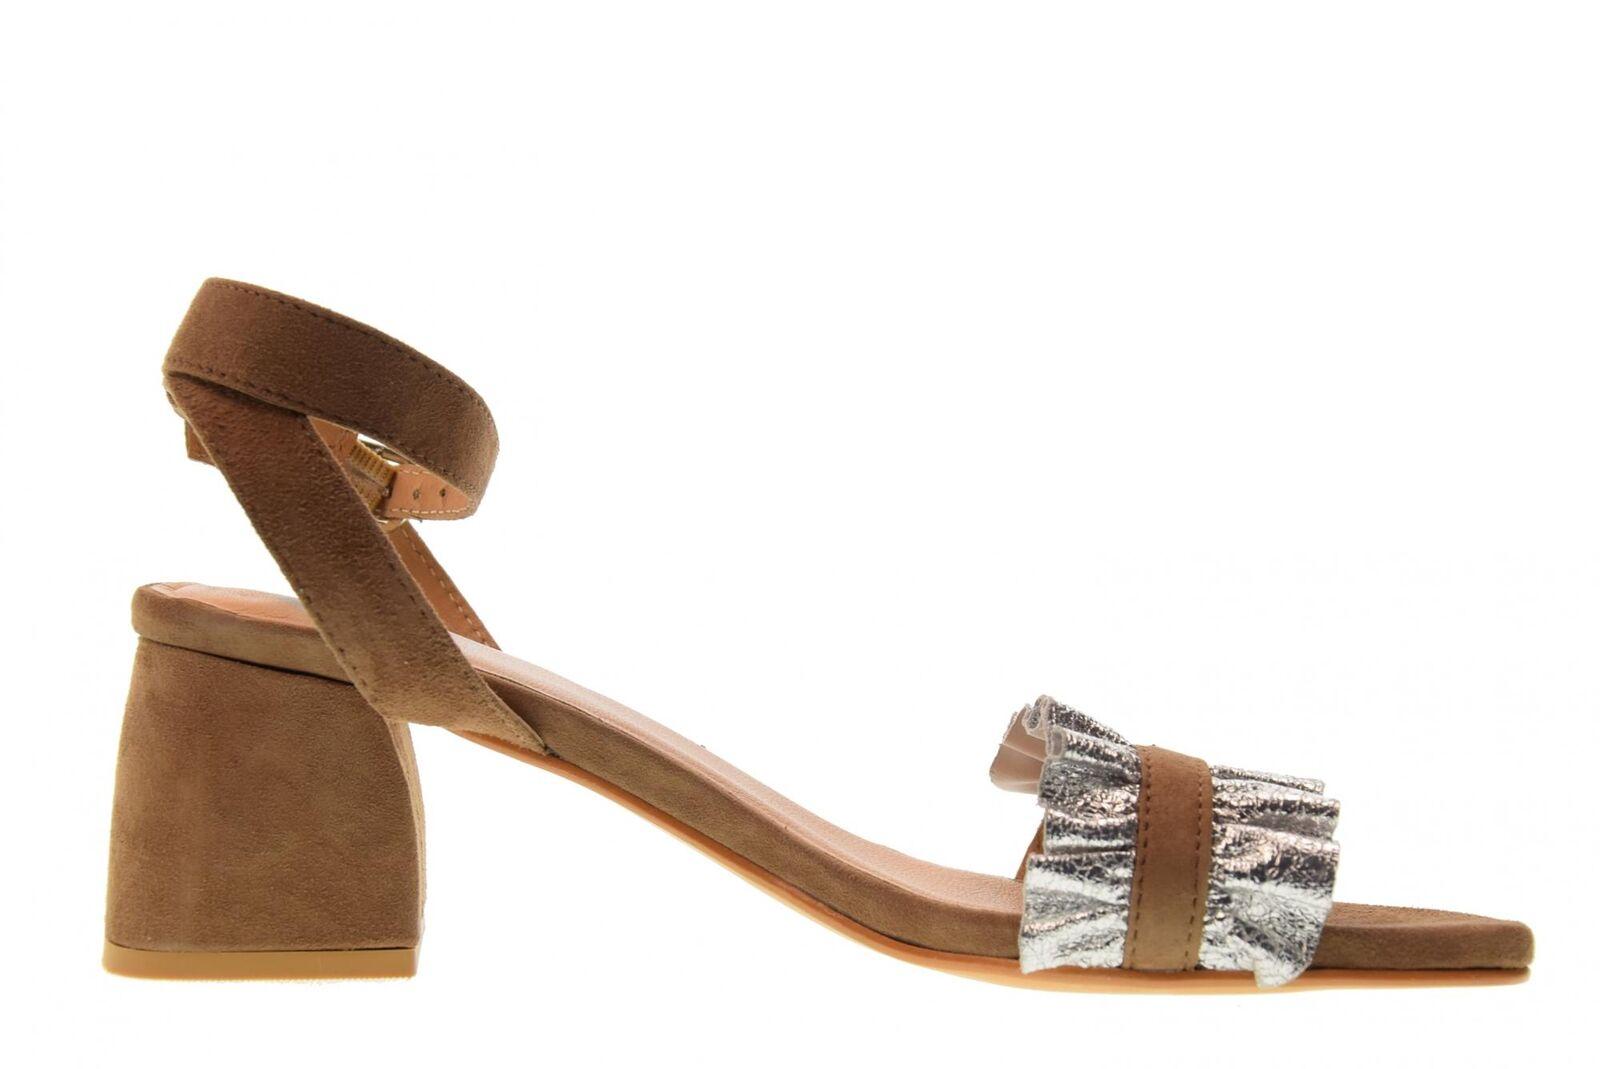 Gioseppo Schuhe Frau niedrigen Sandalen niedrigen Frau Absatz 45301 Silber / Sand P18g ebca59